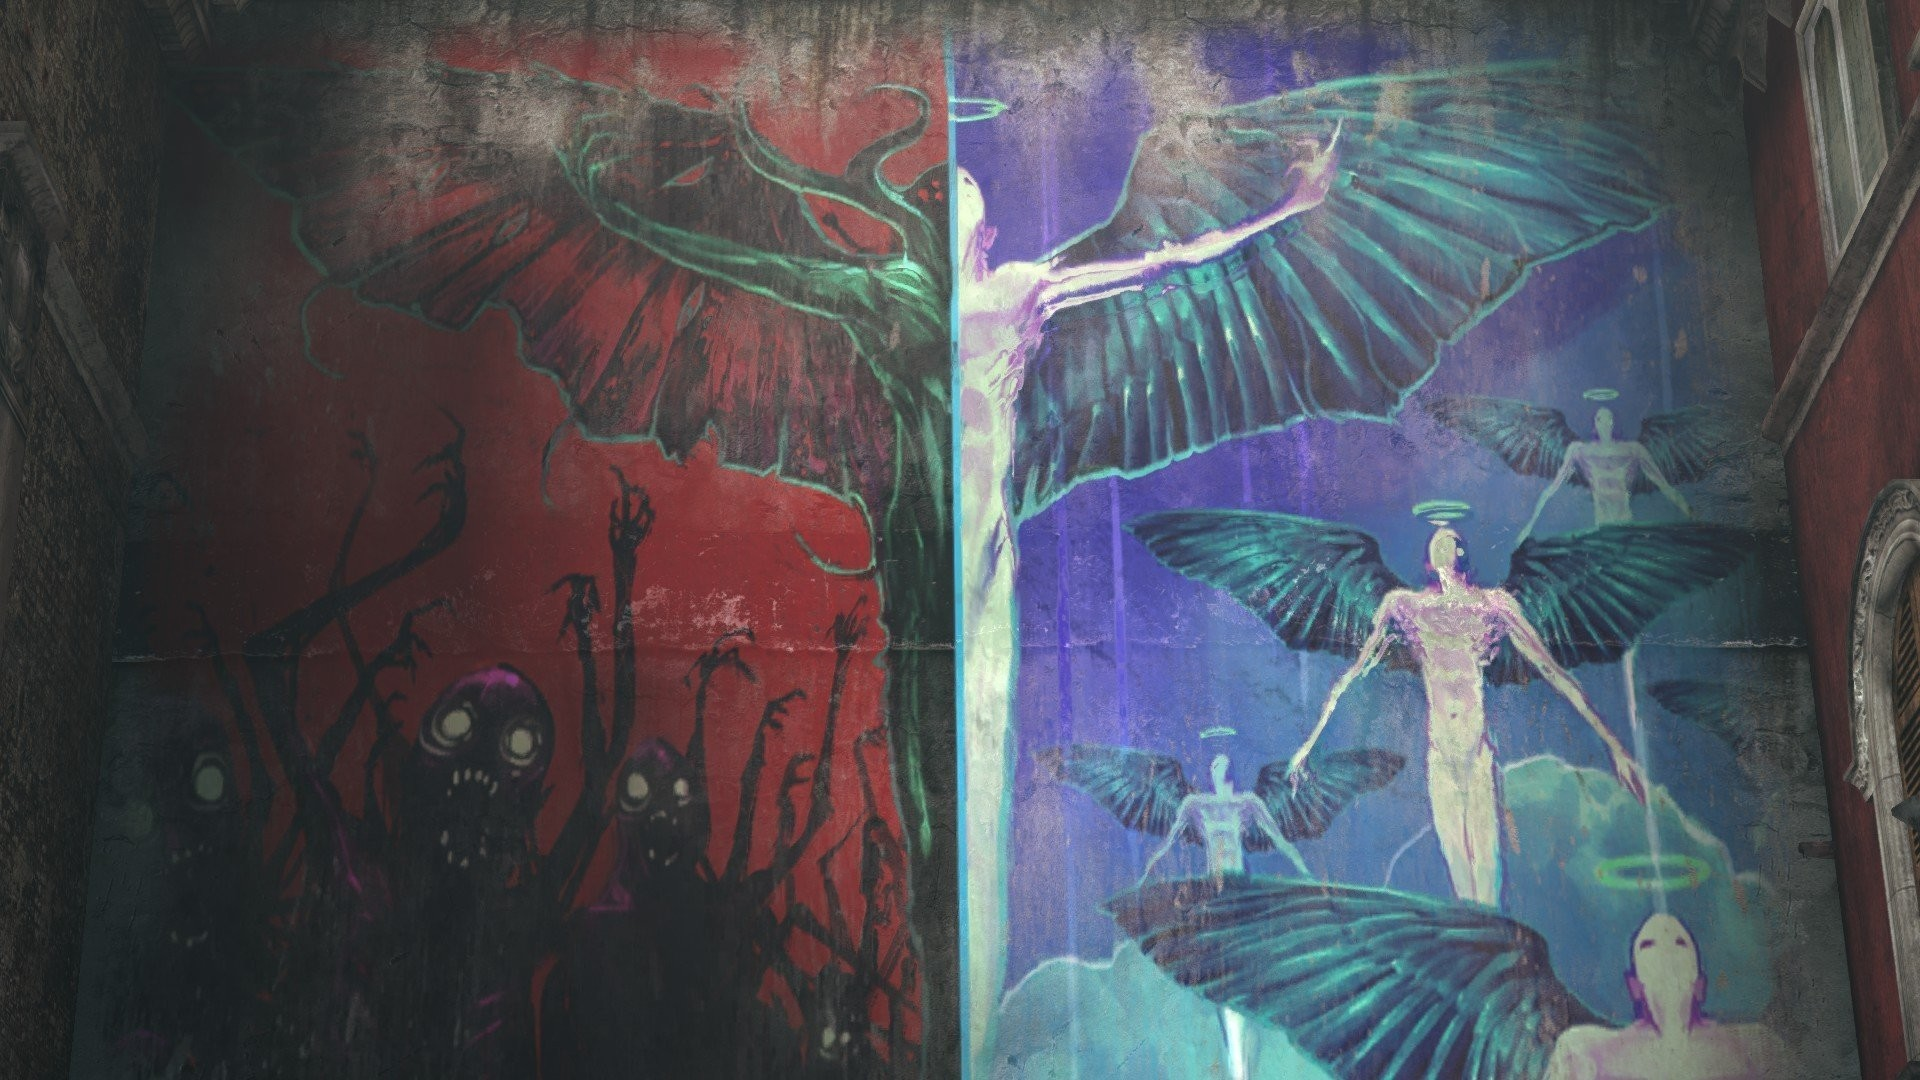 Angels Demons Heaven Amp Hell Graffiti Walls Wings Halo DmC Devil May Cry